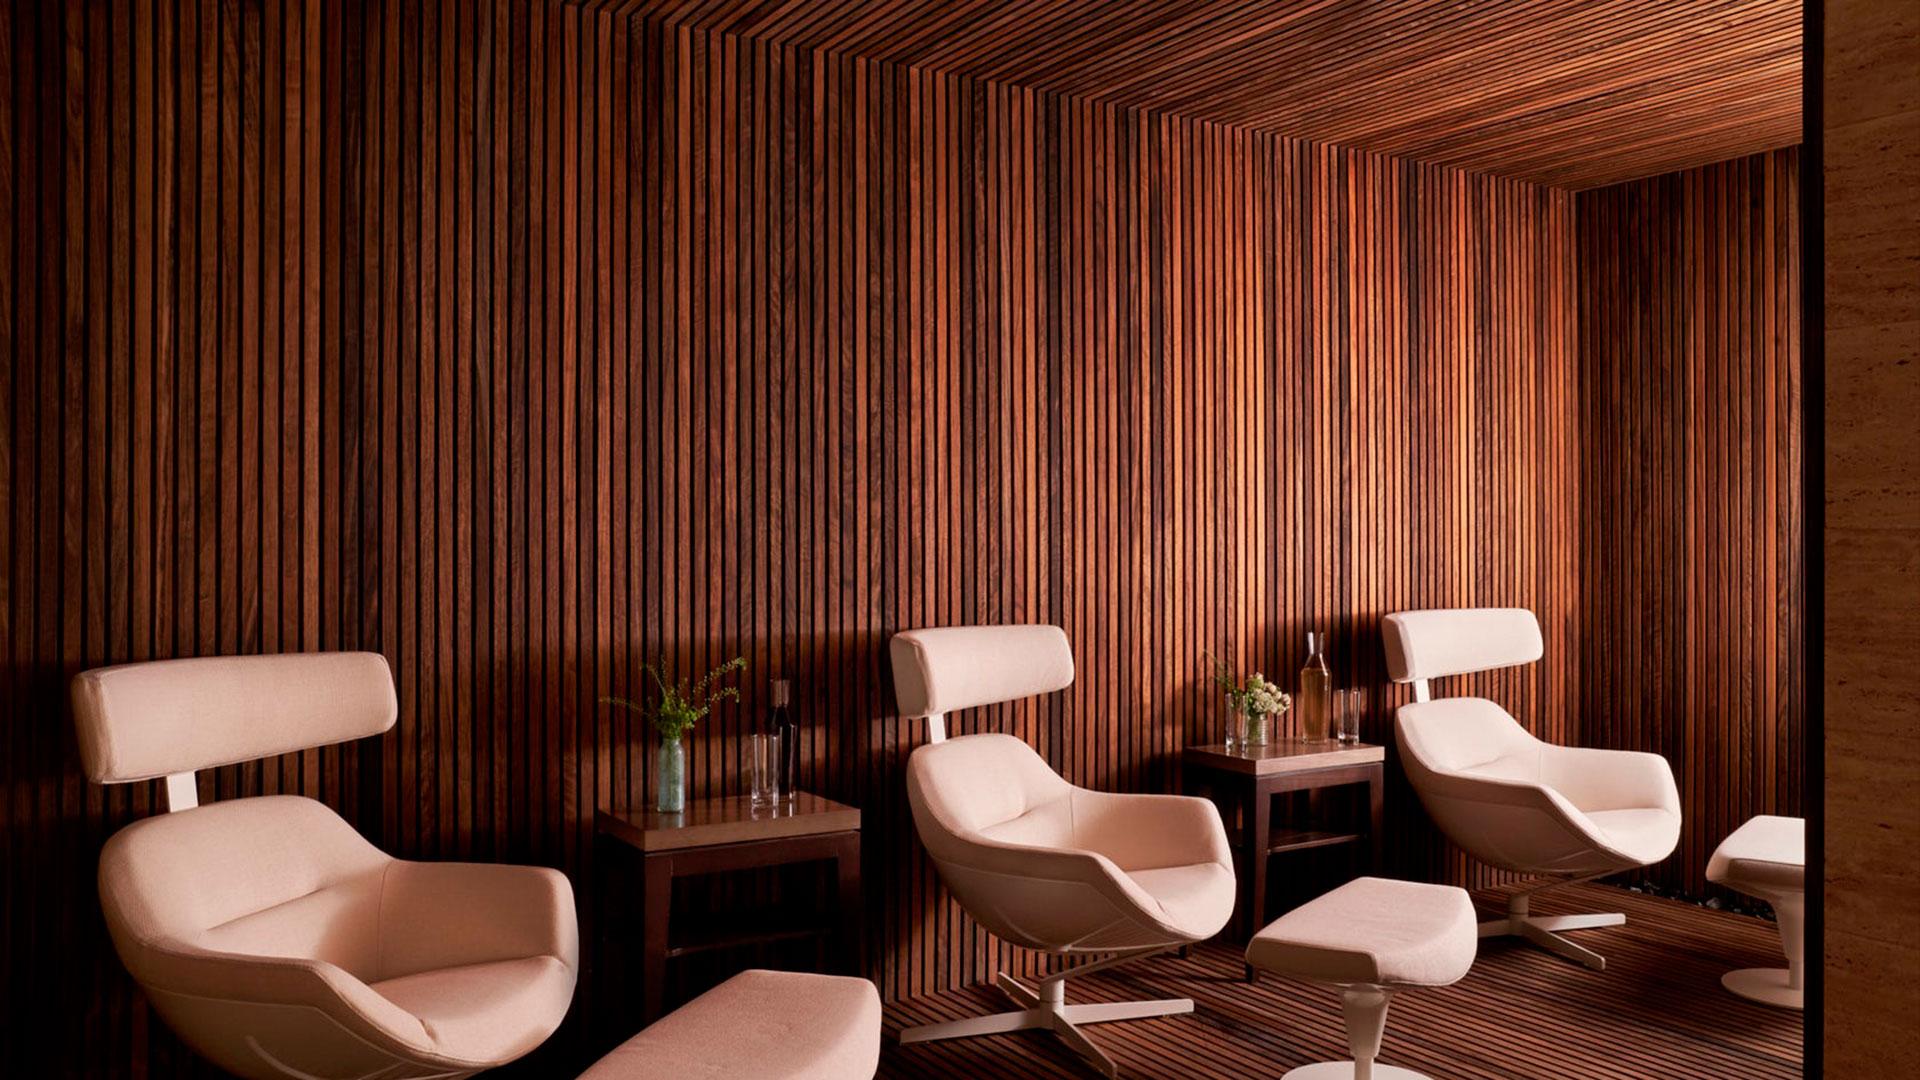 Imagen del Mytha Spa del Hotel Villamagna de Madrid